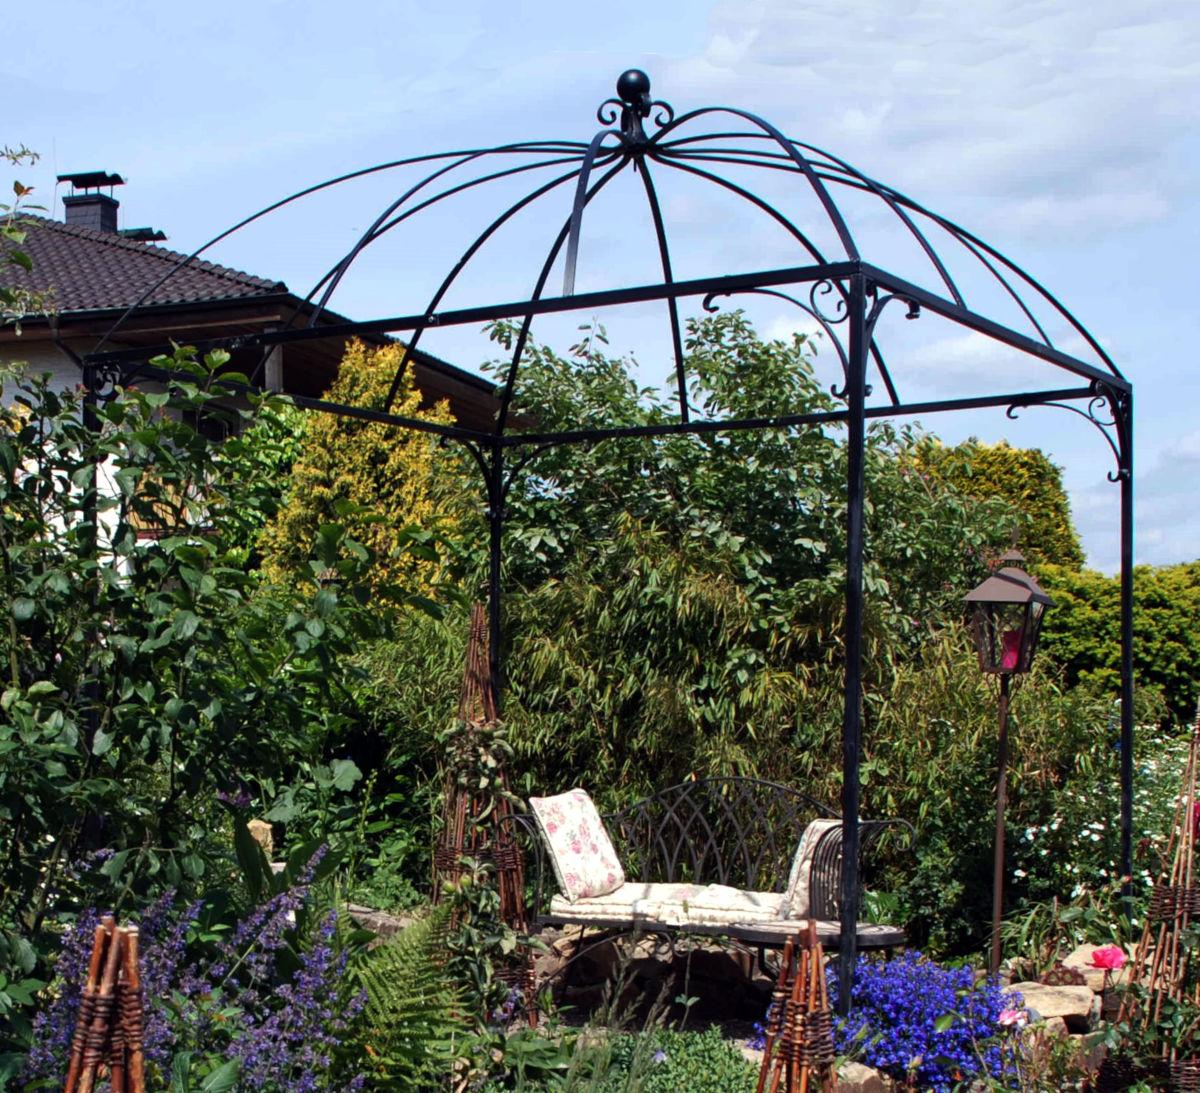 Full Size of Pavillon Metall Klein Gartenpavillon Baumarkt Toom Glas Verzinkte Gartenpavillons Aus In Vielen Ausfhrungen Regal Weiß Regale Bett Wohnzimmer Gartenpavillon Metall